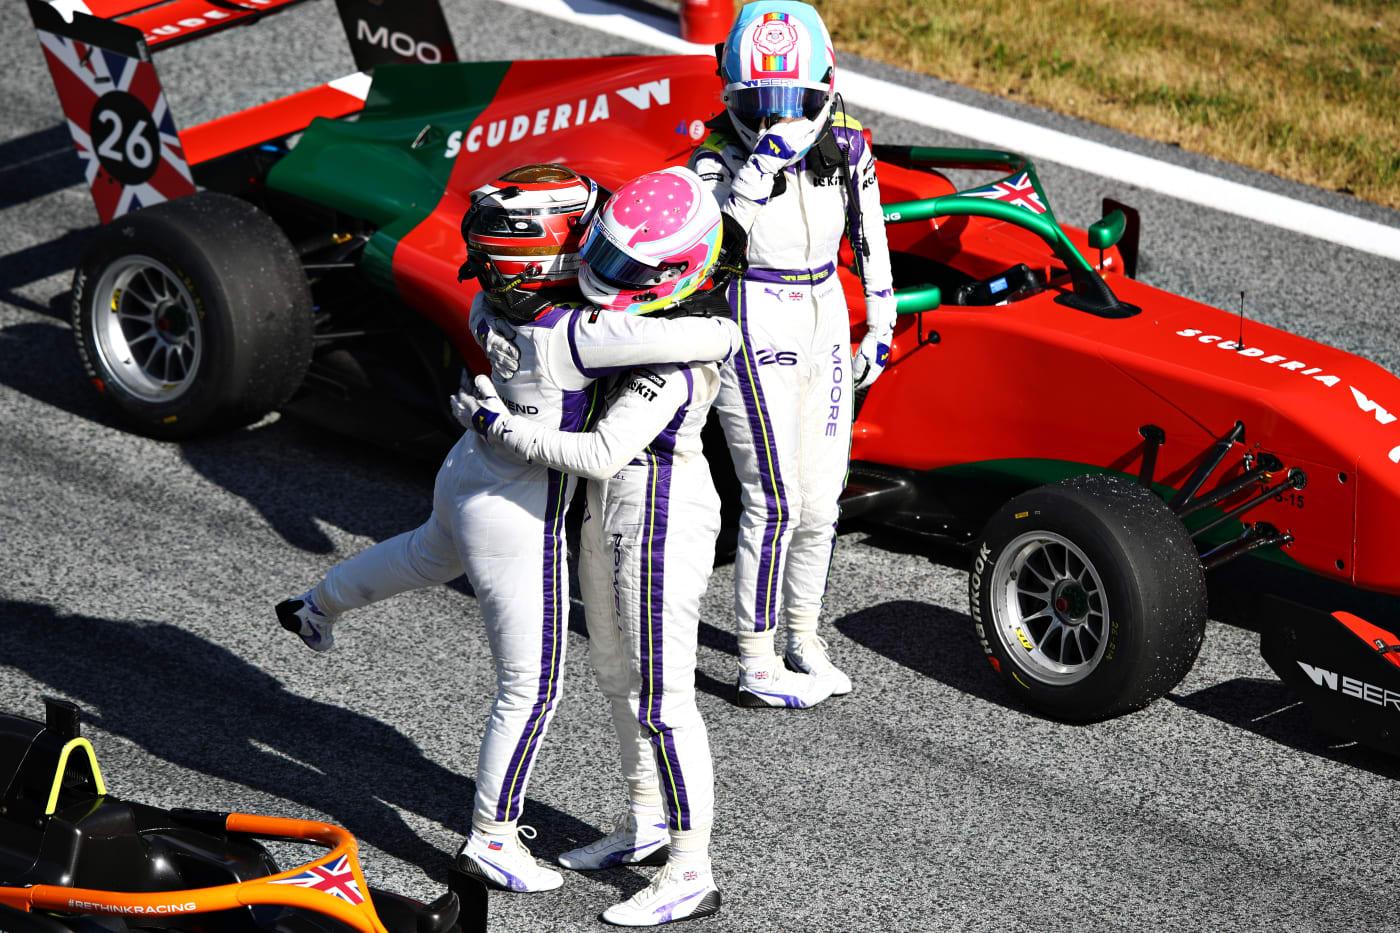 How The W Series Is Revolutionising Motorsport